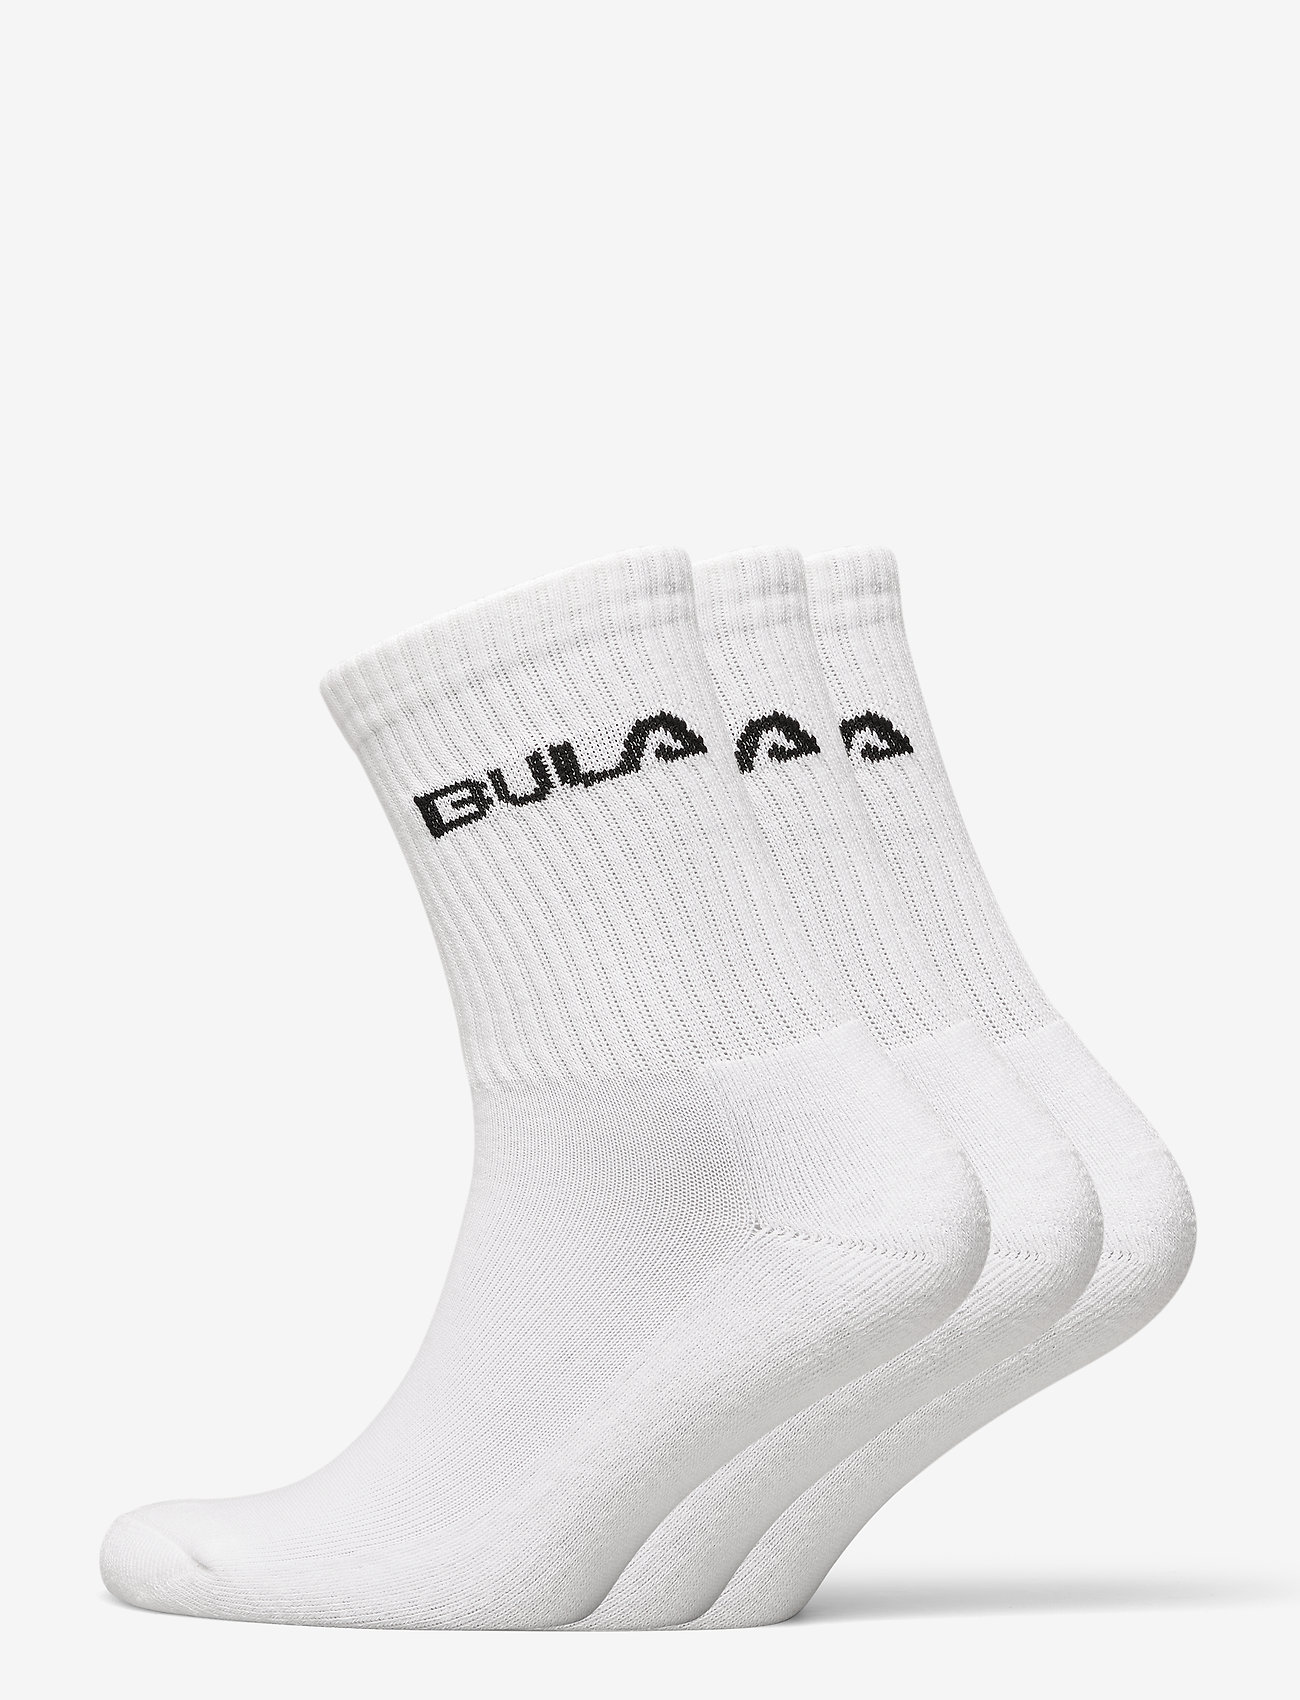 Bula - CLASSICSOCK3PK - reguläre strümpfe - white - 0